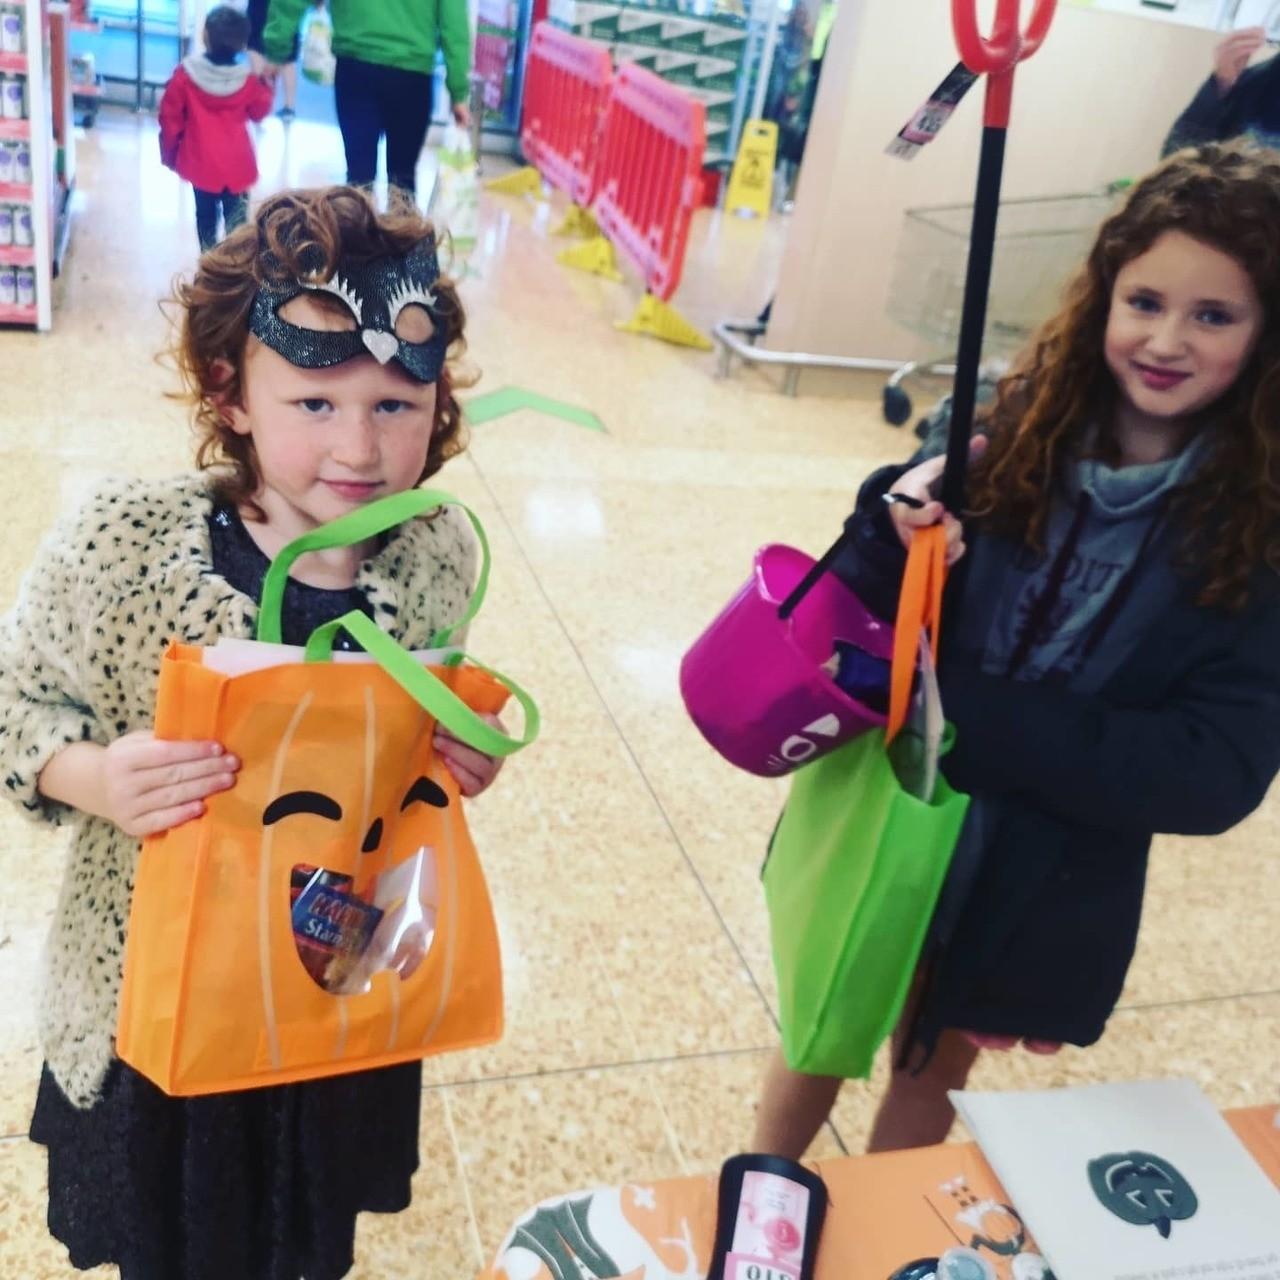 Spooky goings on at Asda Lancaster | Asda Lancaster